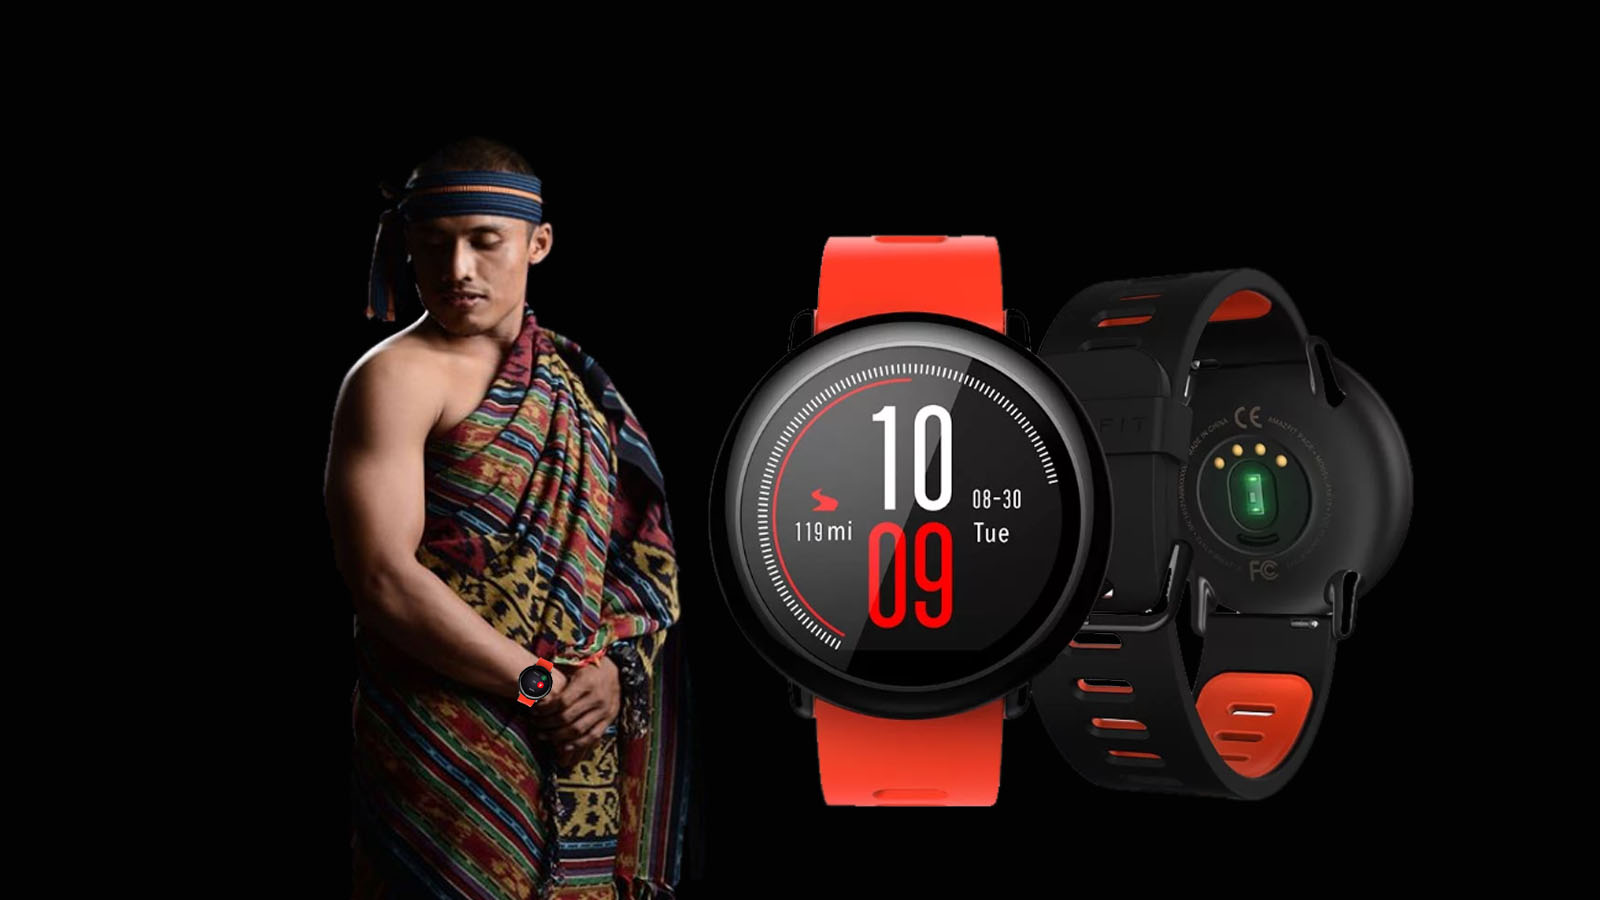 Spesifikasi Smartwatch Xiaomi Amazfit Pace, harga amazfit pace 2  harga amazfit bip  harga amazfit stratos  harga amazfit verge  spesifikasi xiaomi amazfit bip  xiaomi amazfit smartwatch  amazfit pace 2 indonesia